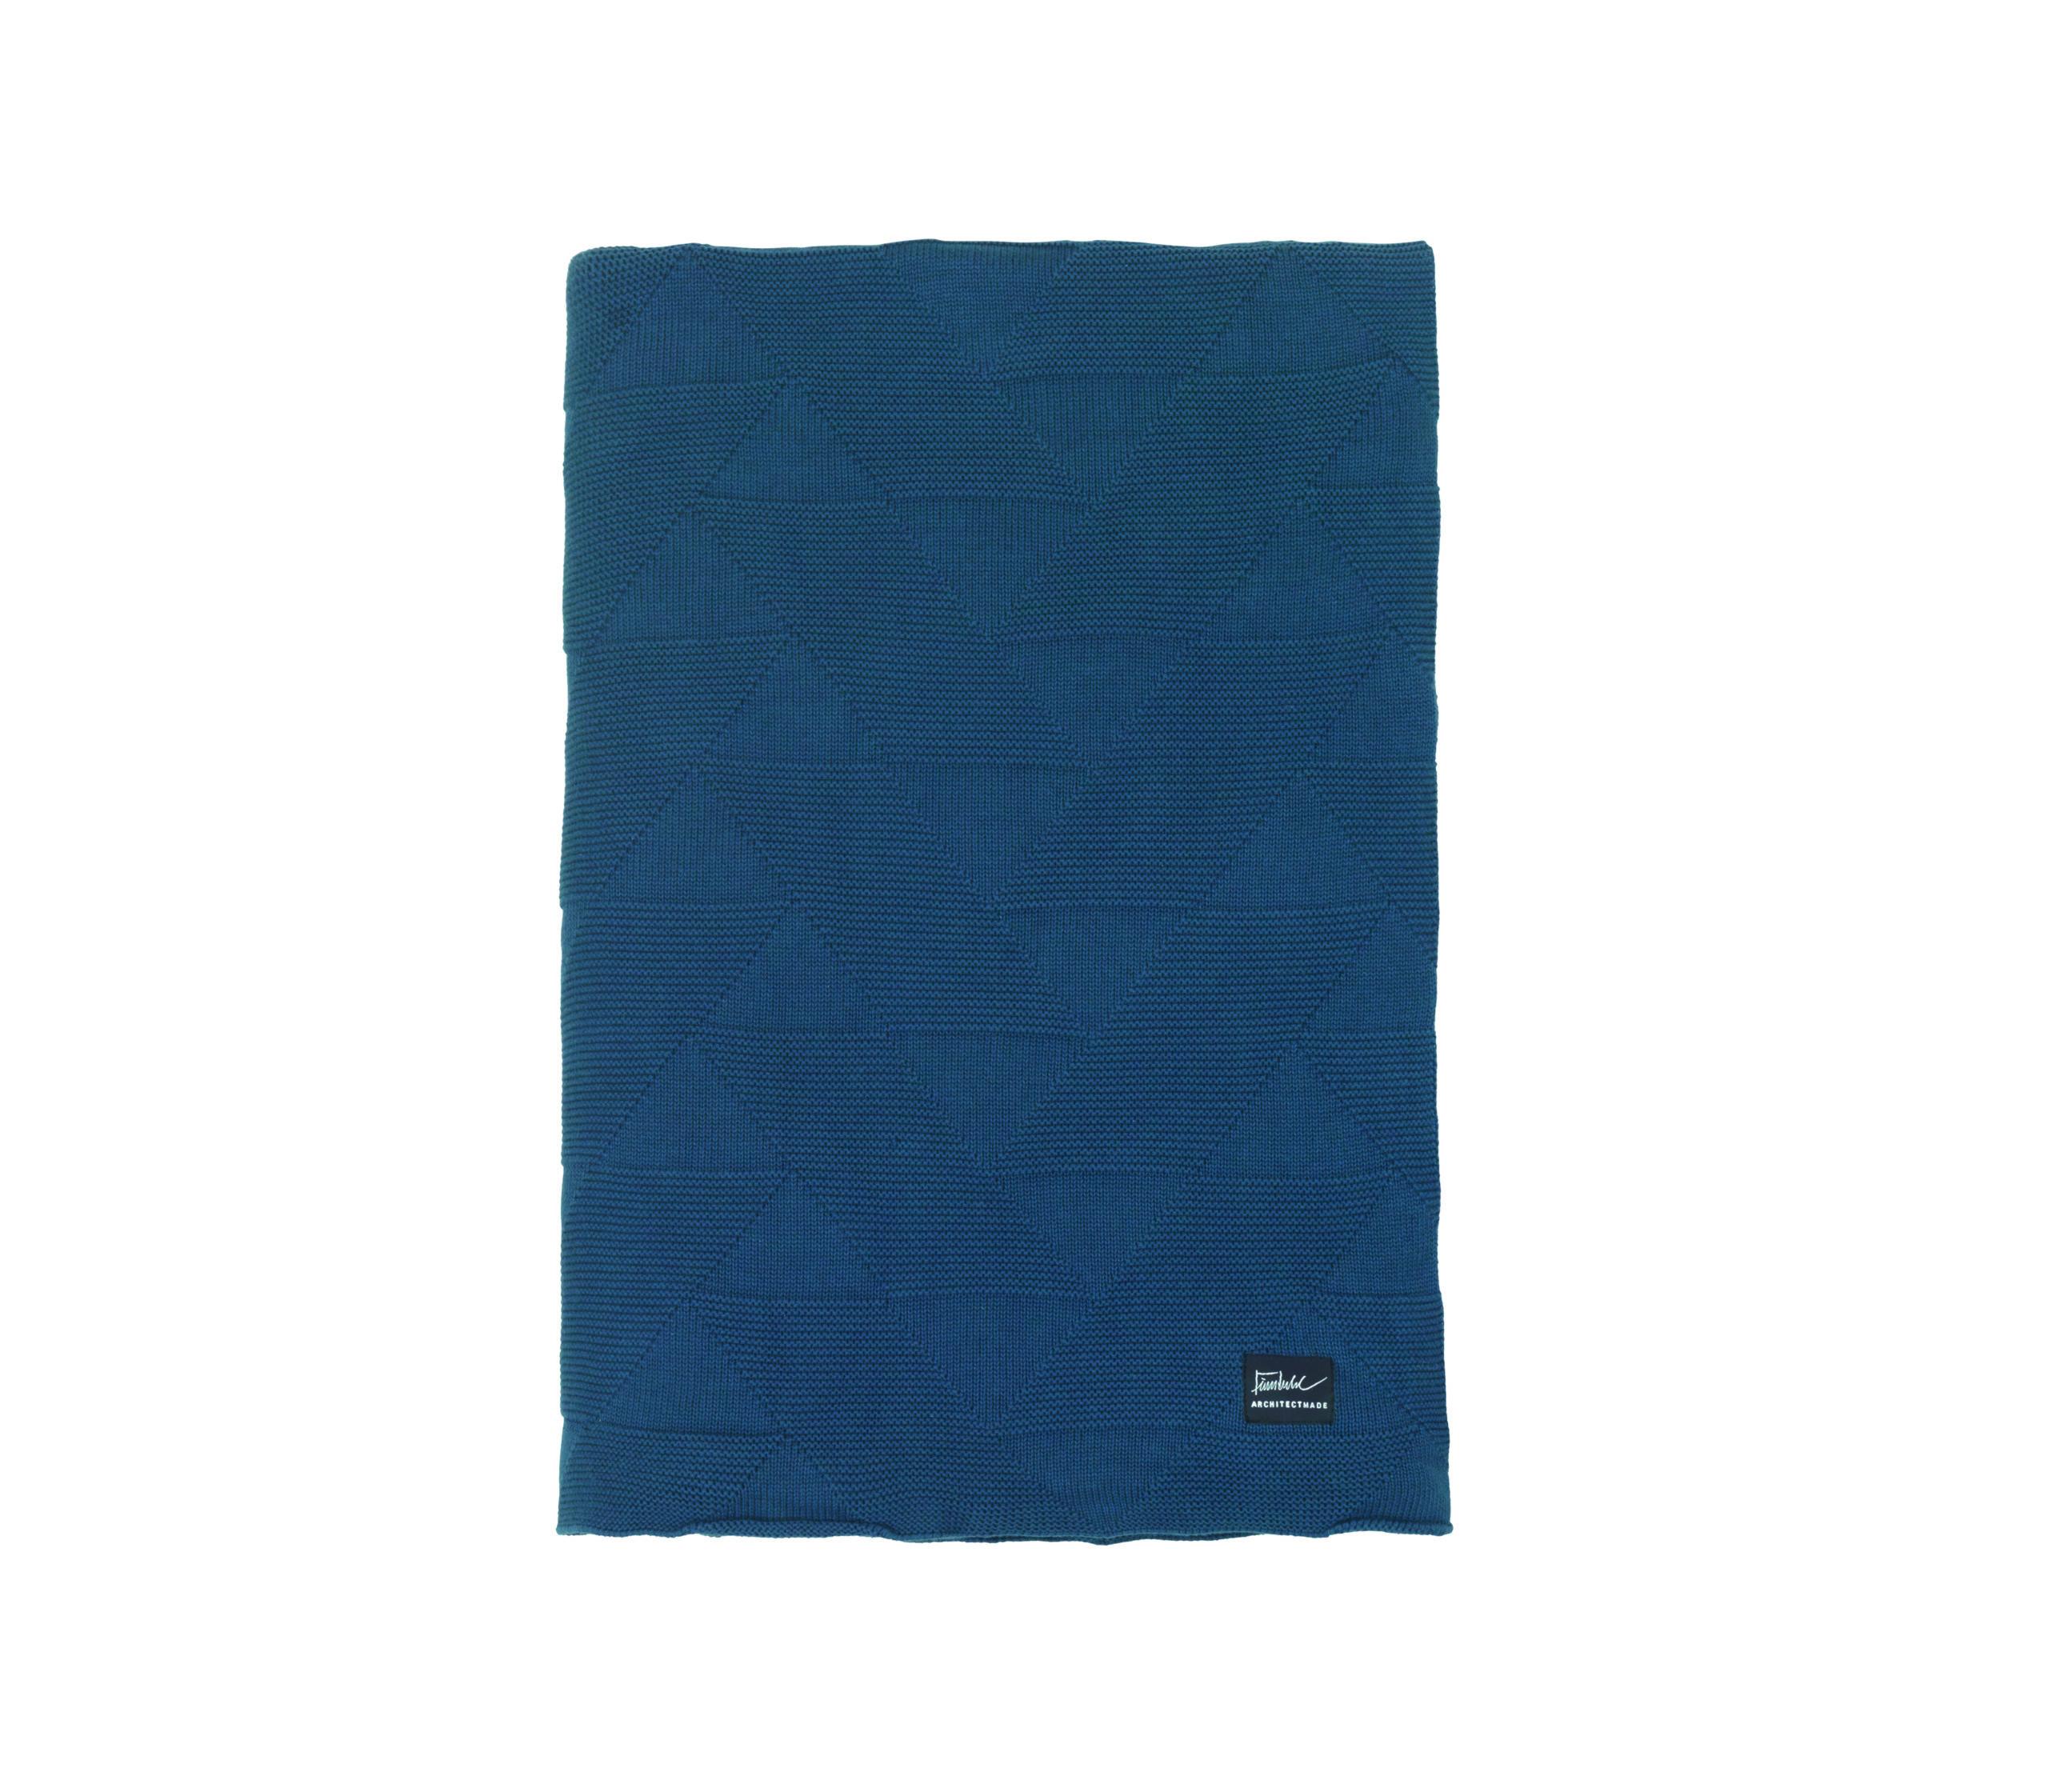 Architectmade-FJ-Pattern-Blanket-Blue-Organic-Cotton-Finn-Juhl